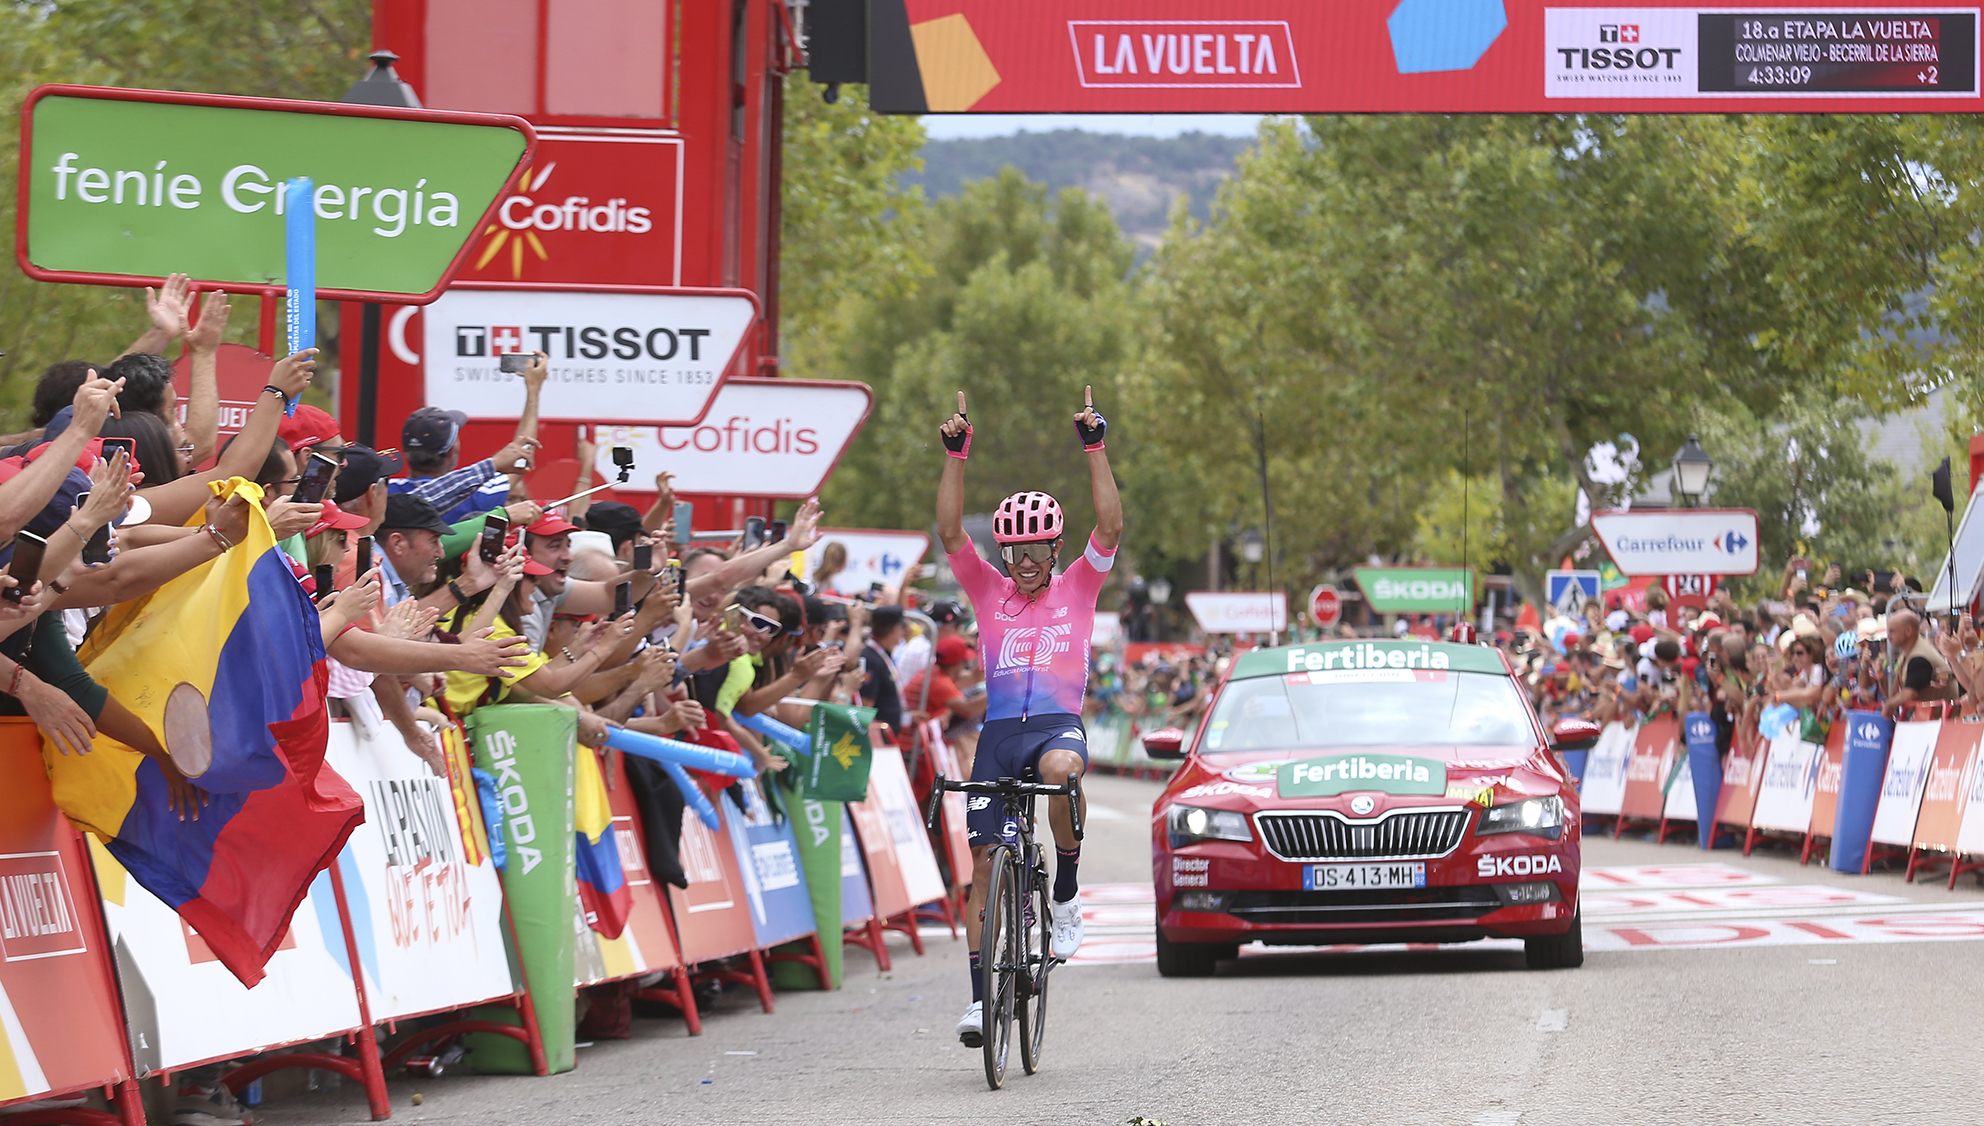 vuelta ciclista Becerril Sergio Higuita